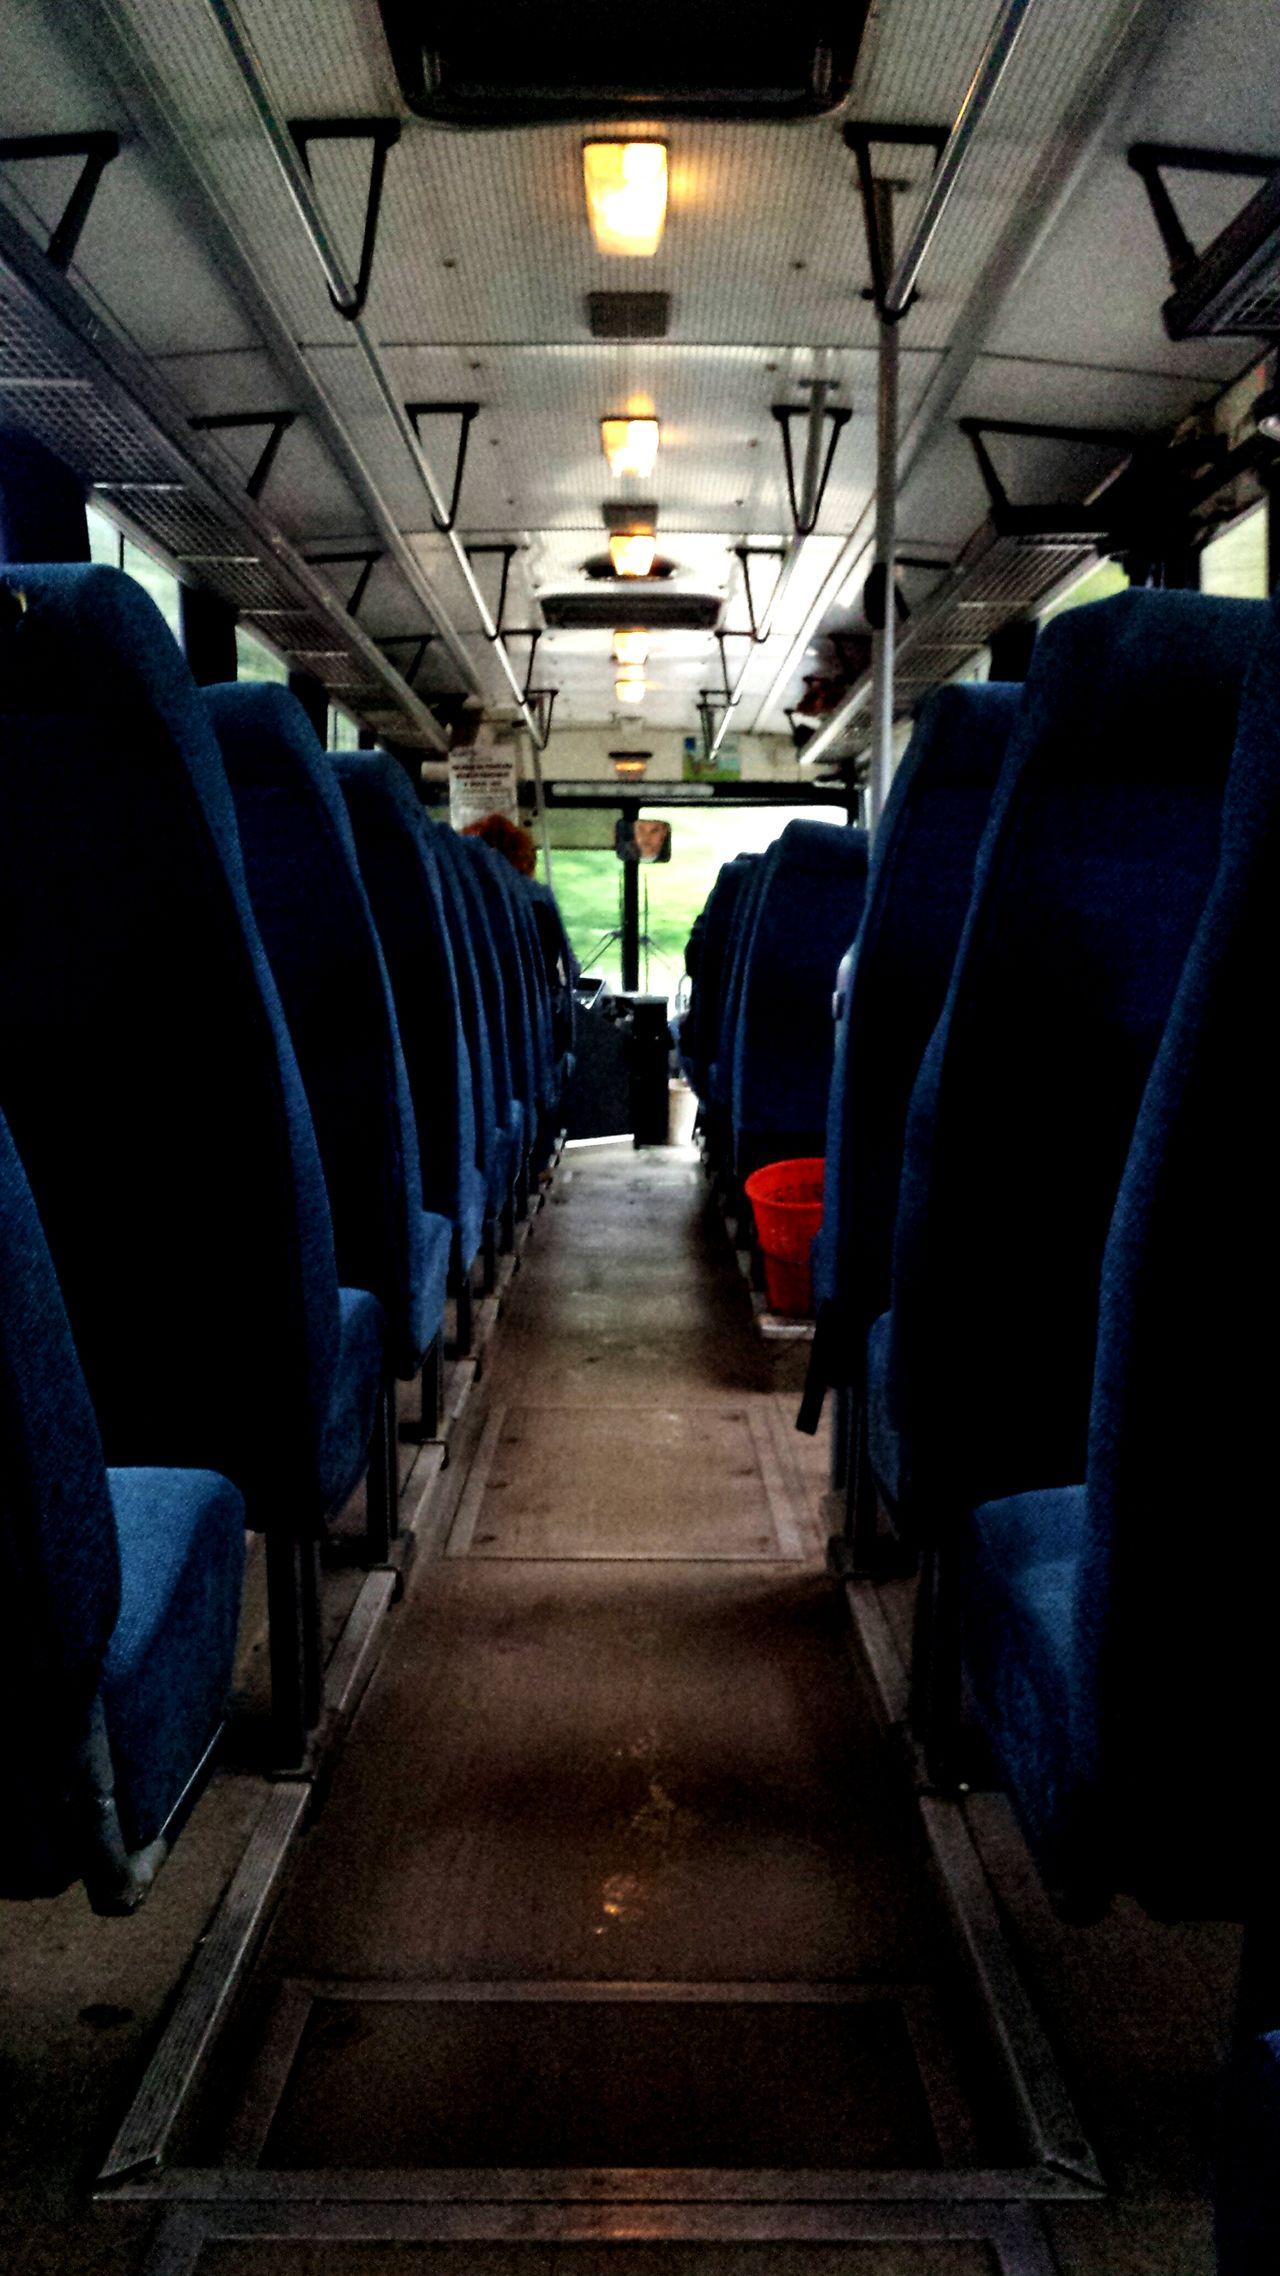 It's not how it looks like, but it looks bad. Bus School Transportation City Bus